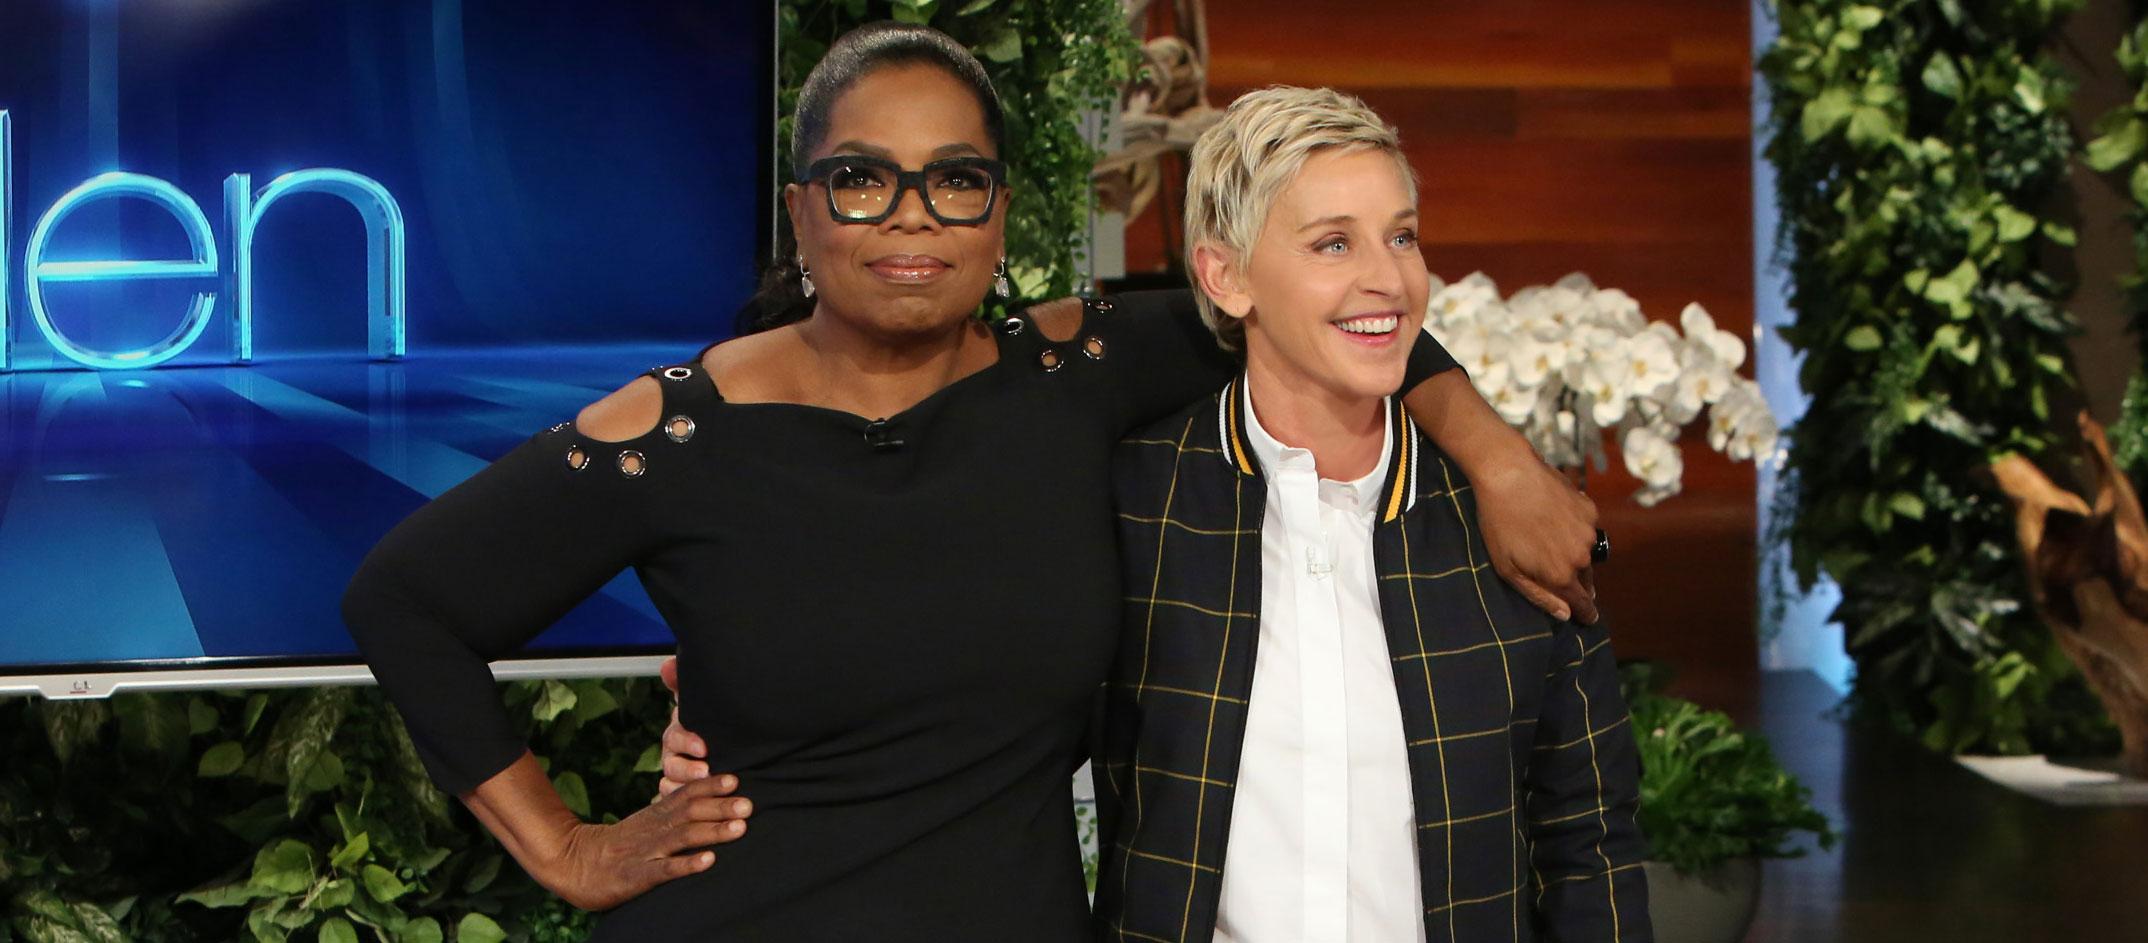 Oprah makes surprise cameo in ellen degeneres star studded magic michelle video ellen - Ellen show address ...